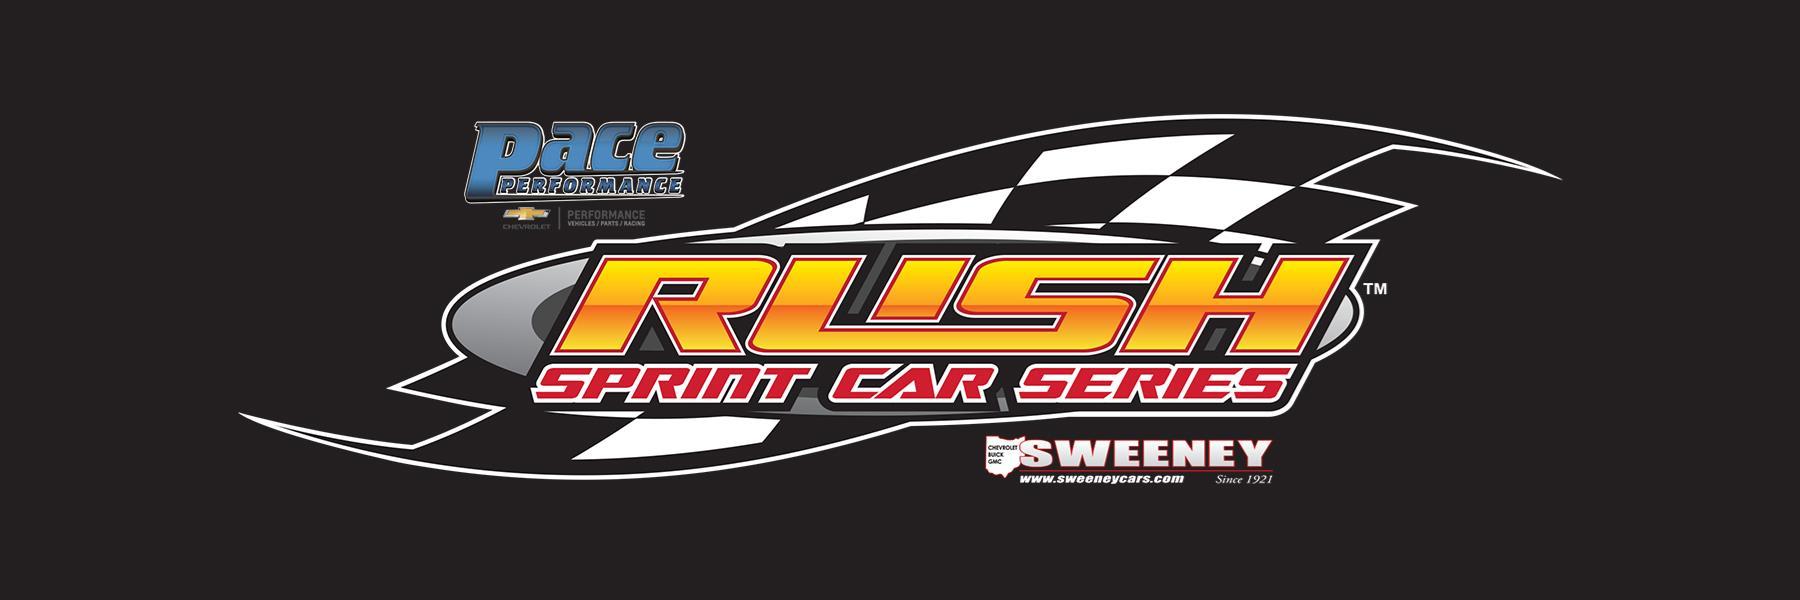 RUSH Sprint Car Series